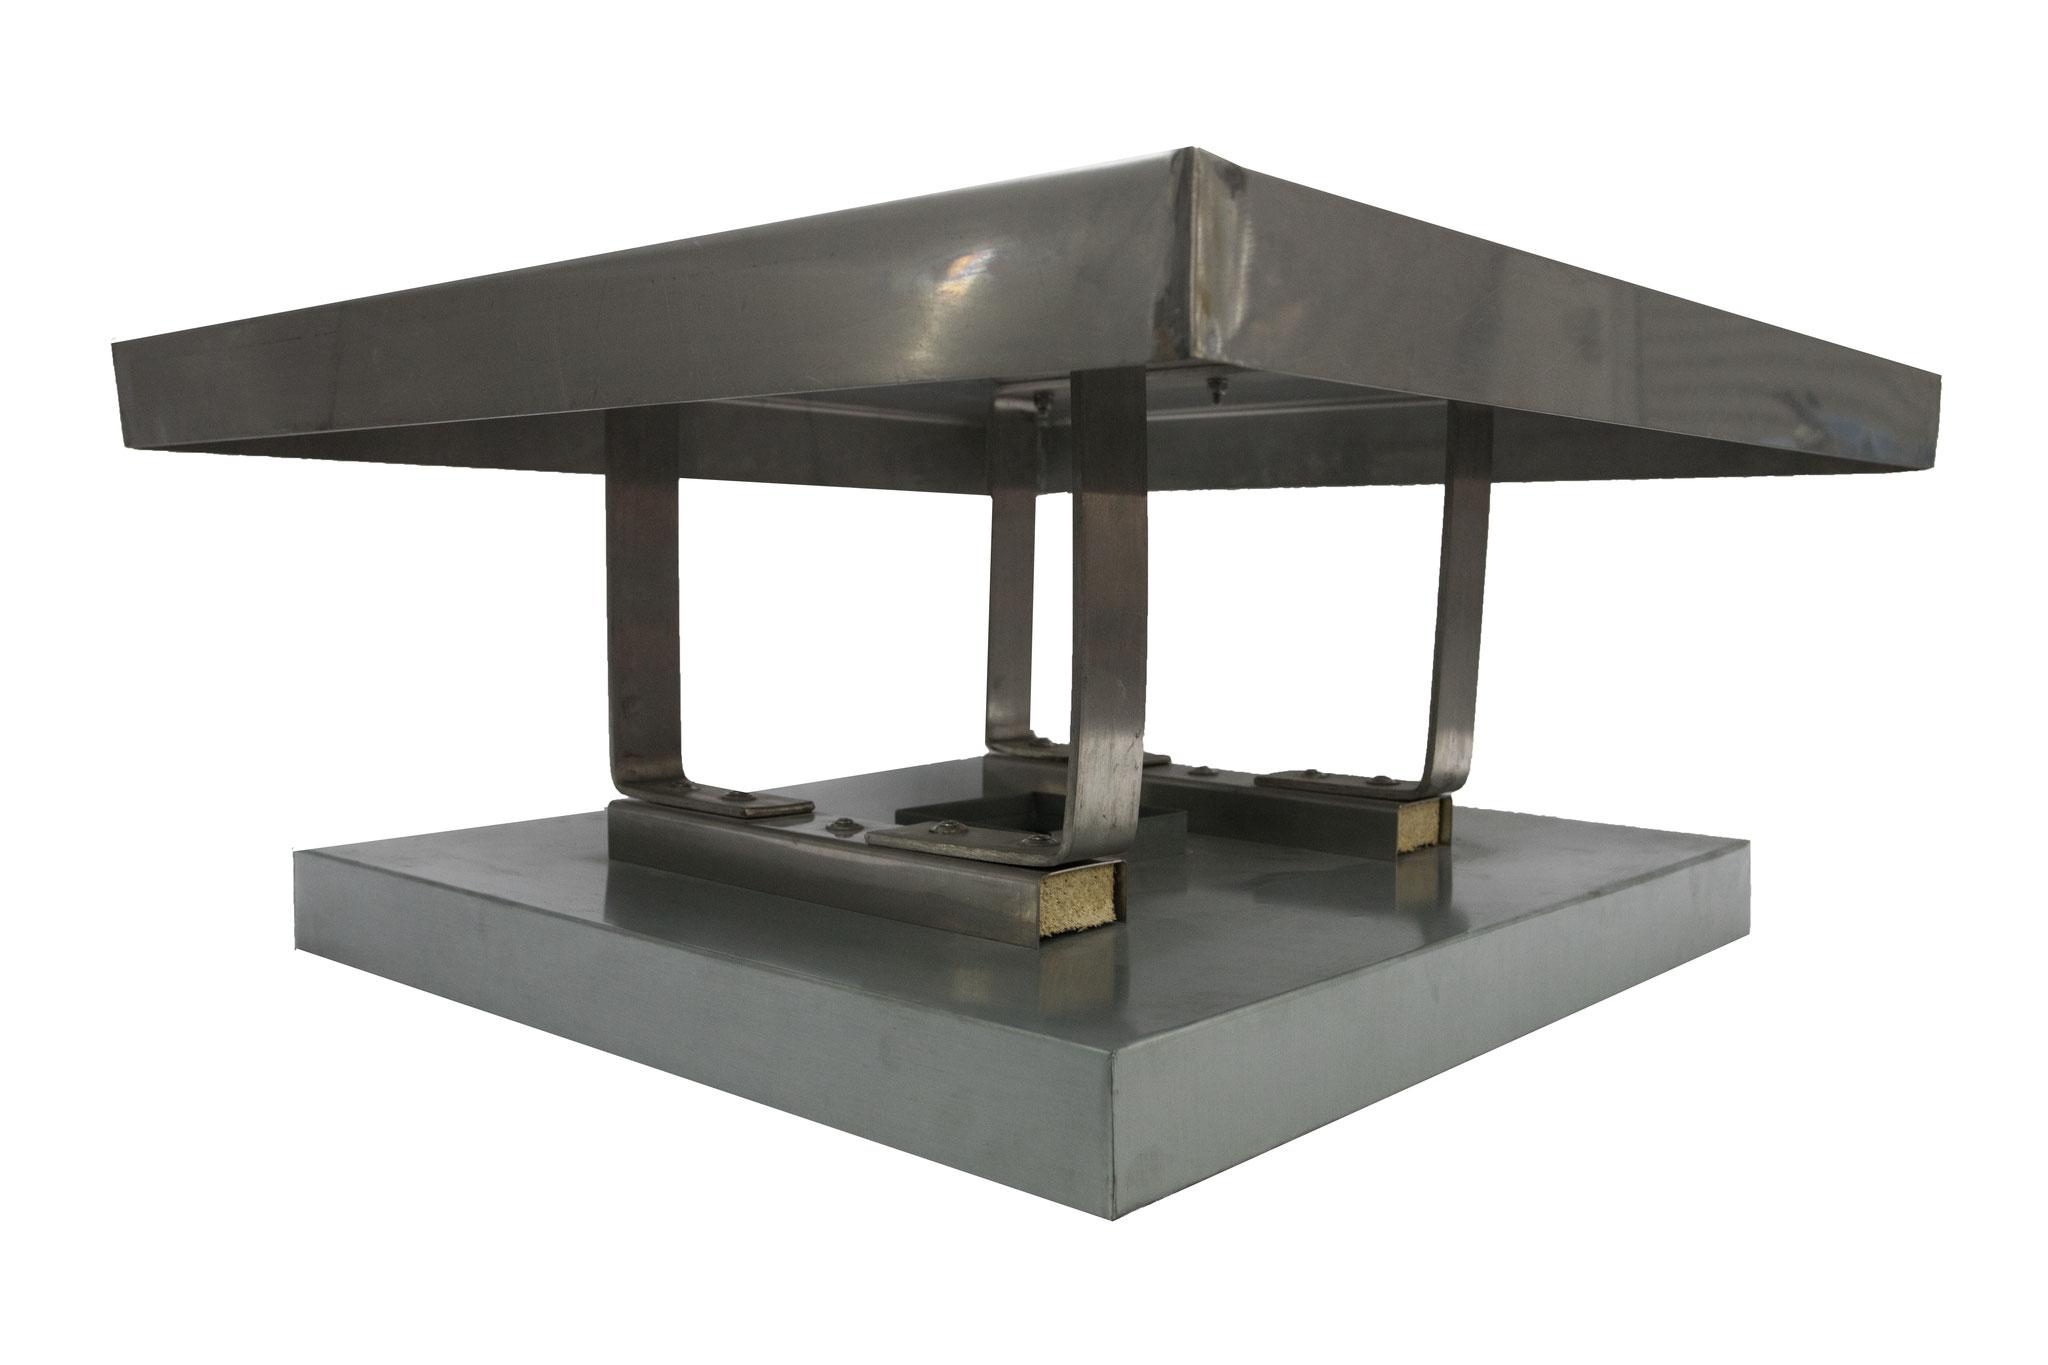 Kaminhaube Form 5 (in VA 1mm stark/in Kupfer 1,5 mm stark)